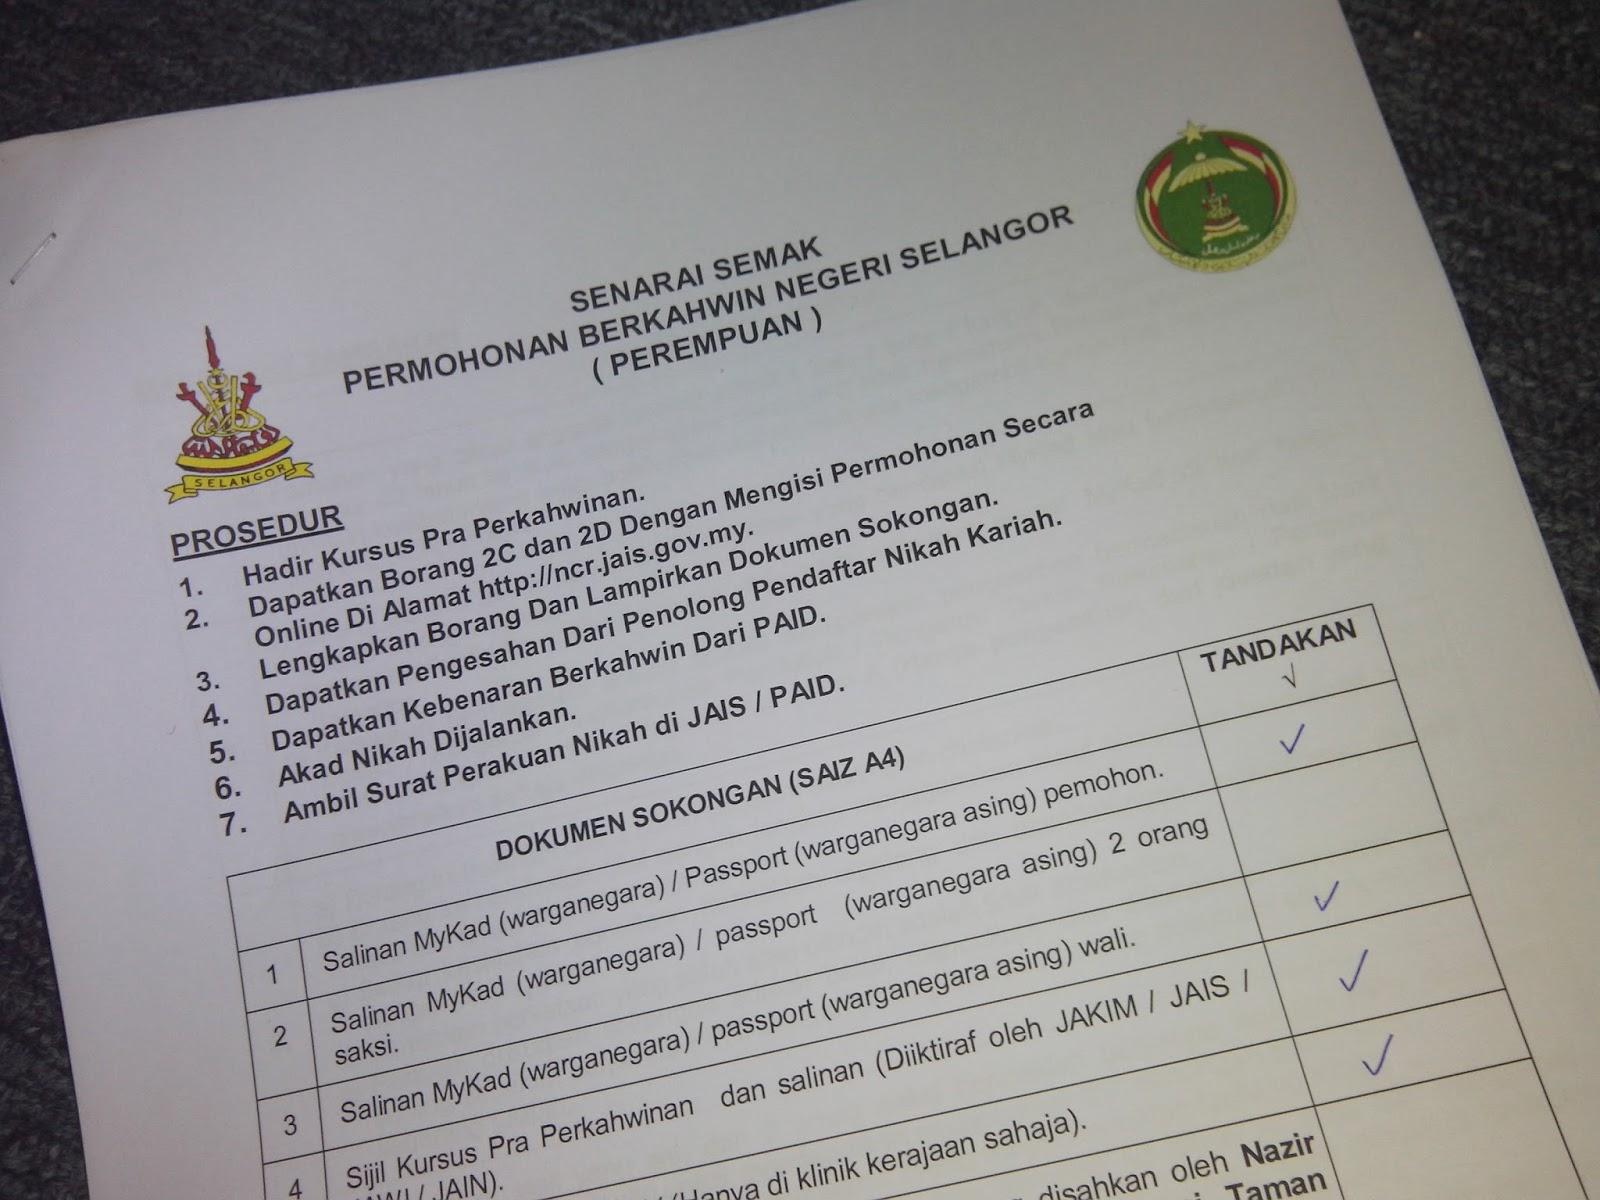 Prosedur Permohonan Kahwin Selangor